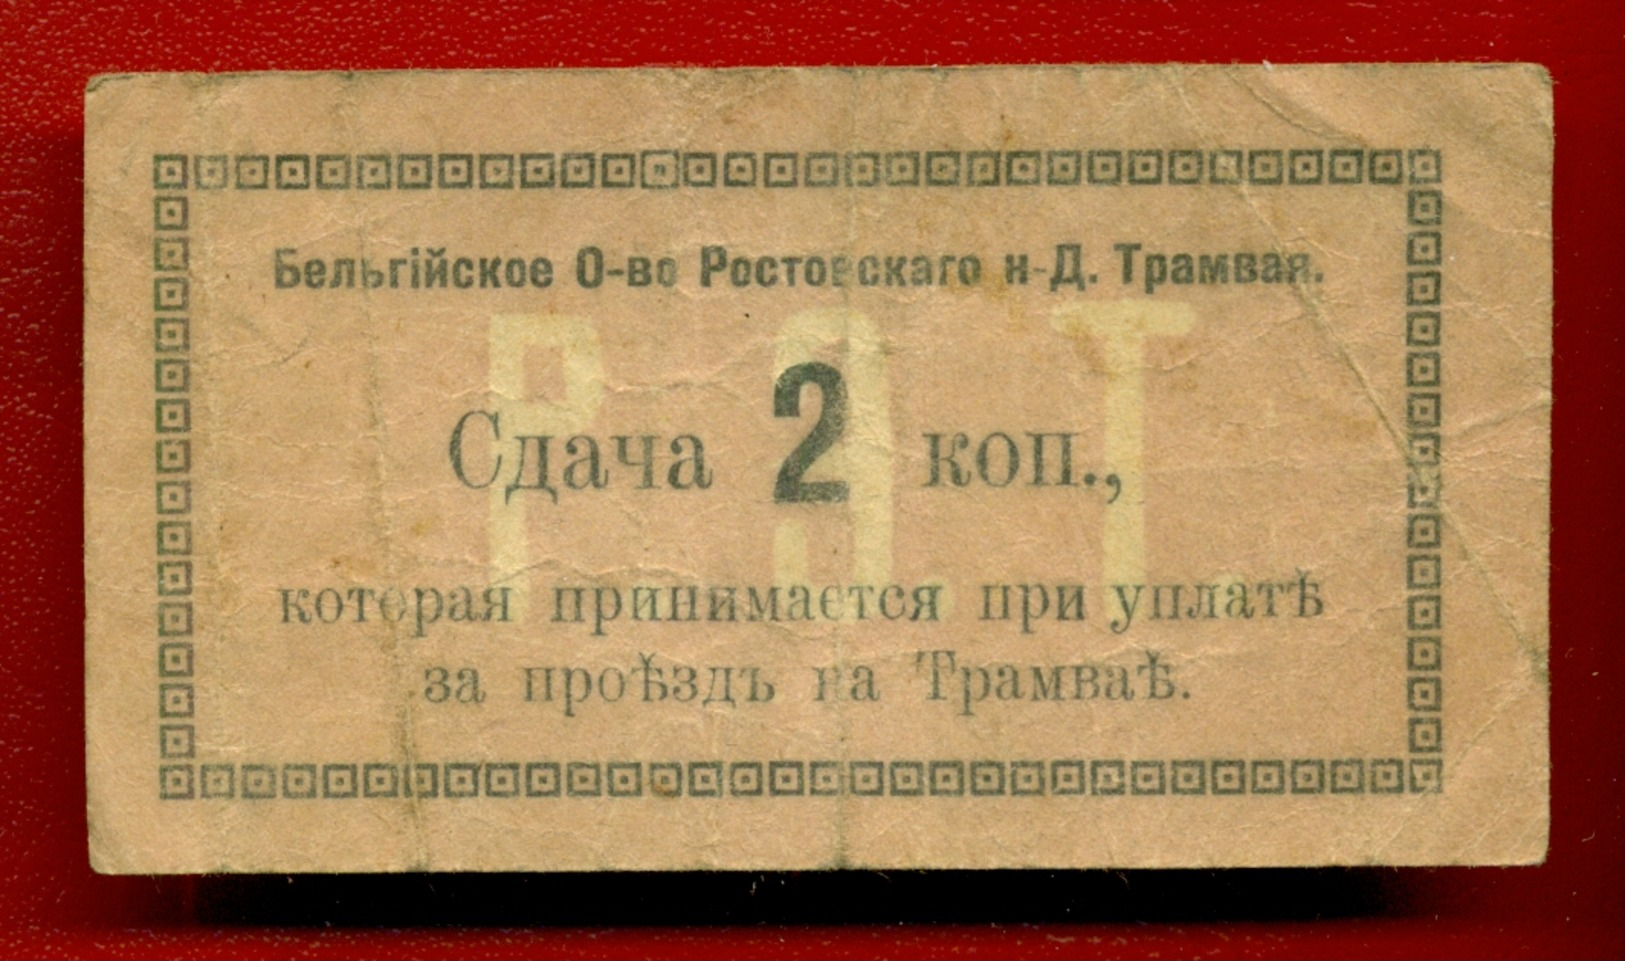 1918 RUSSIA RUSSLAND ROSTOV-NA-DONU 2 KOPEKS Tram 1690 - Russland